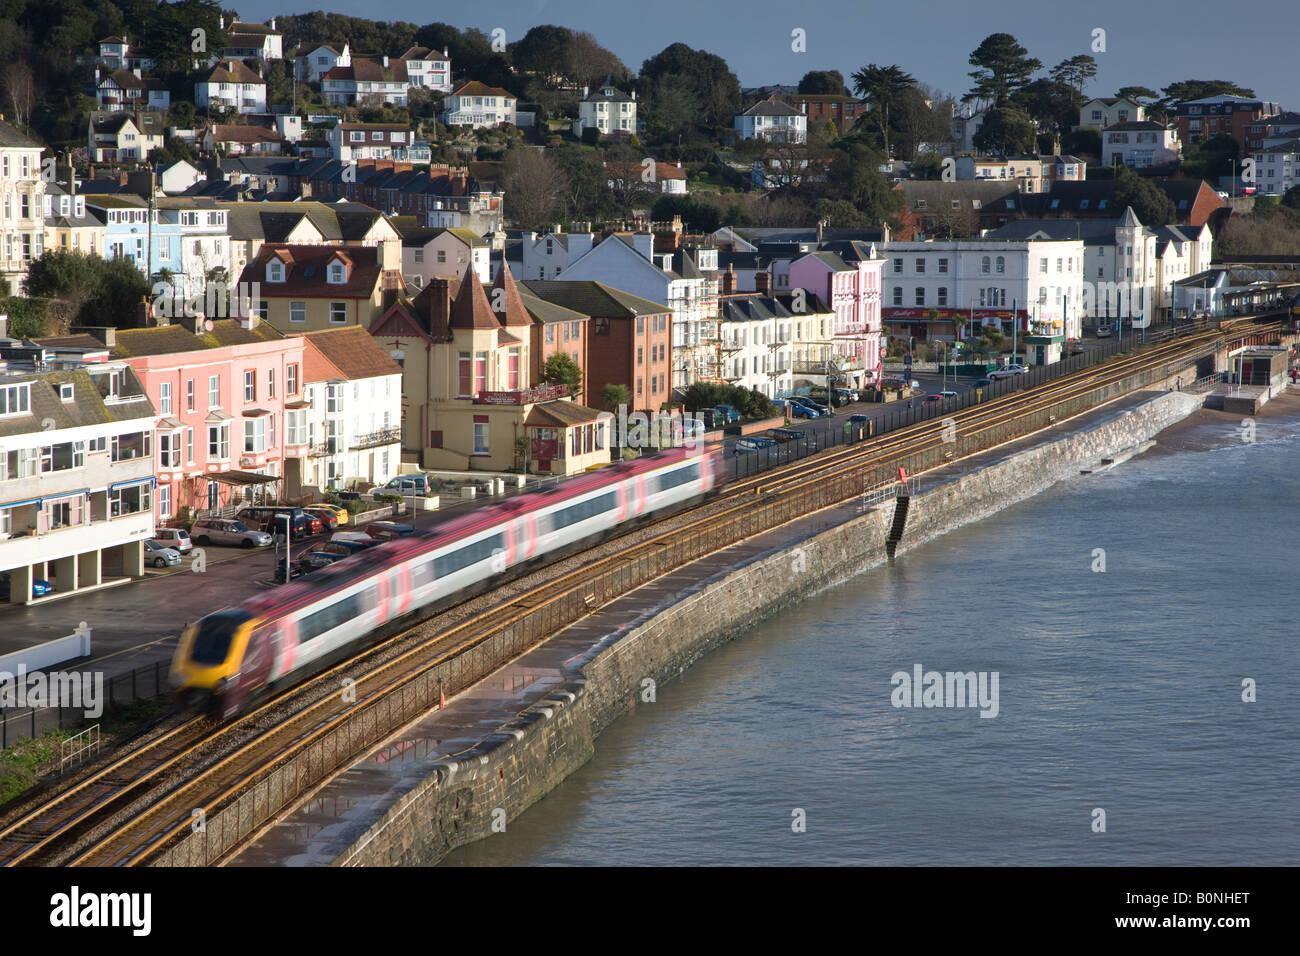 Dawlish seafront with railway line Stock Photo